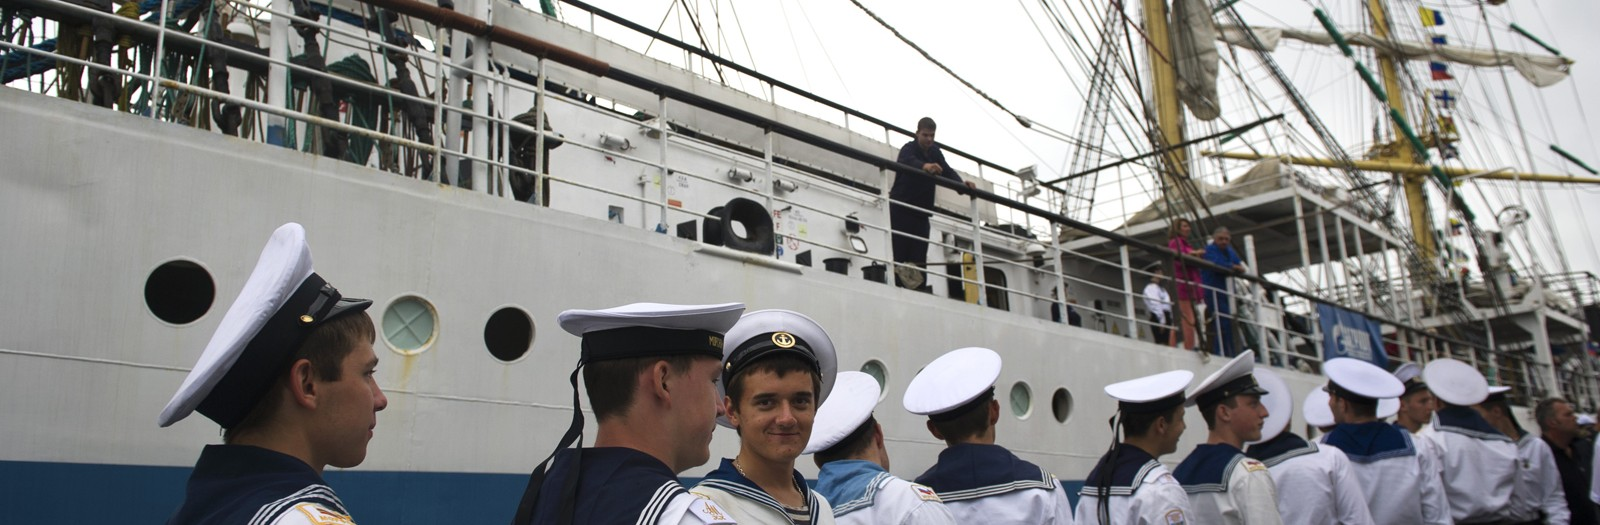 Sail de Ruyter groot succes